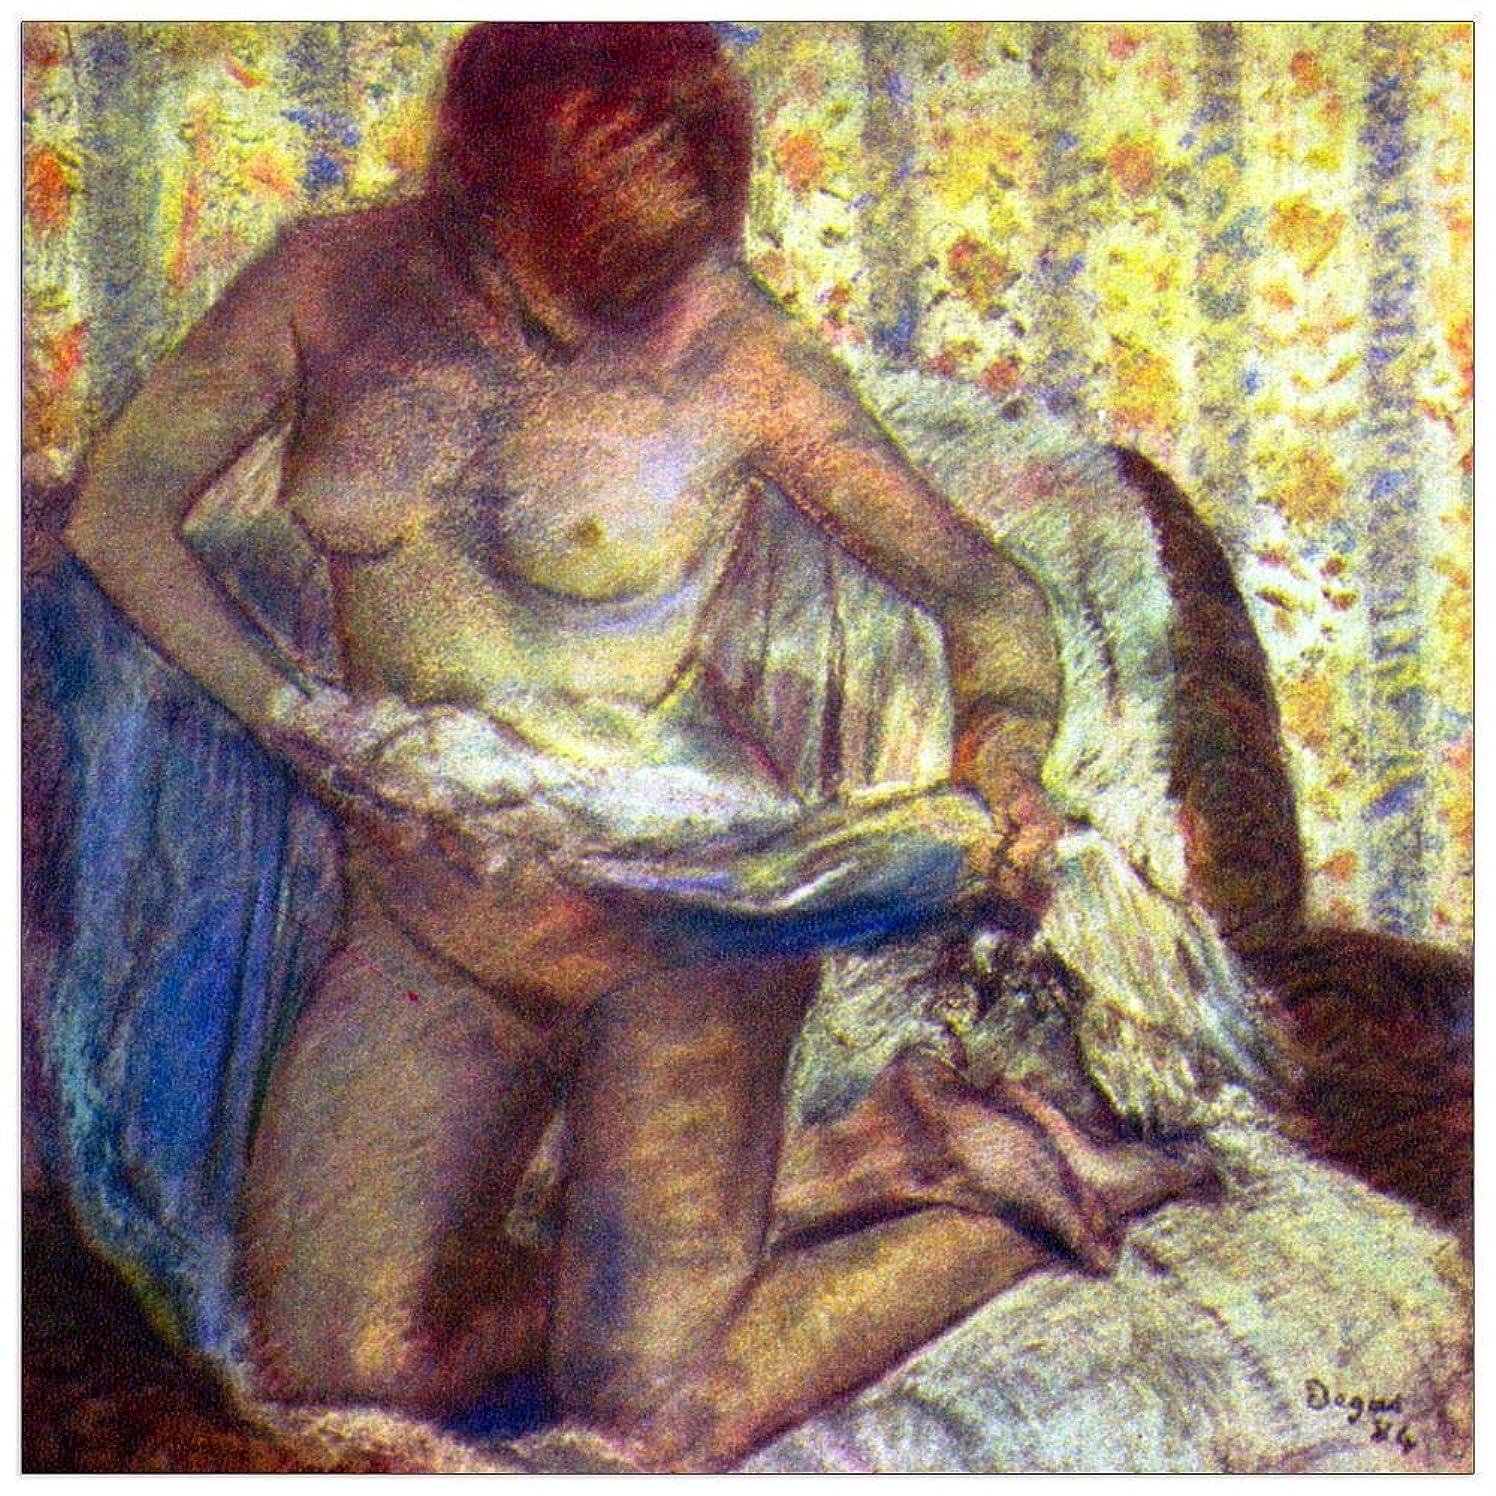 ArtPlaza TW93078 Degas Edgar - Nude Woman Decorative Panel 31.5x31.5